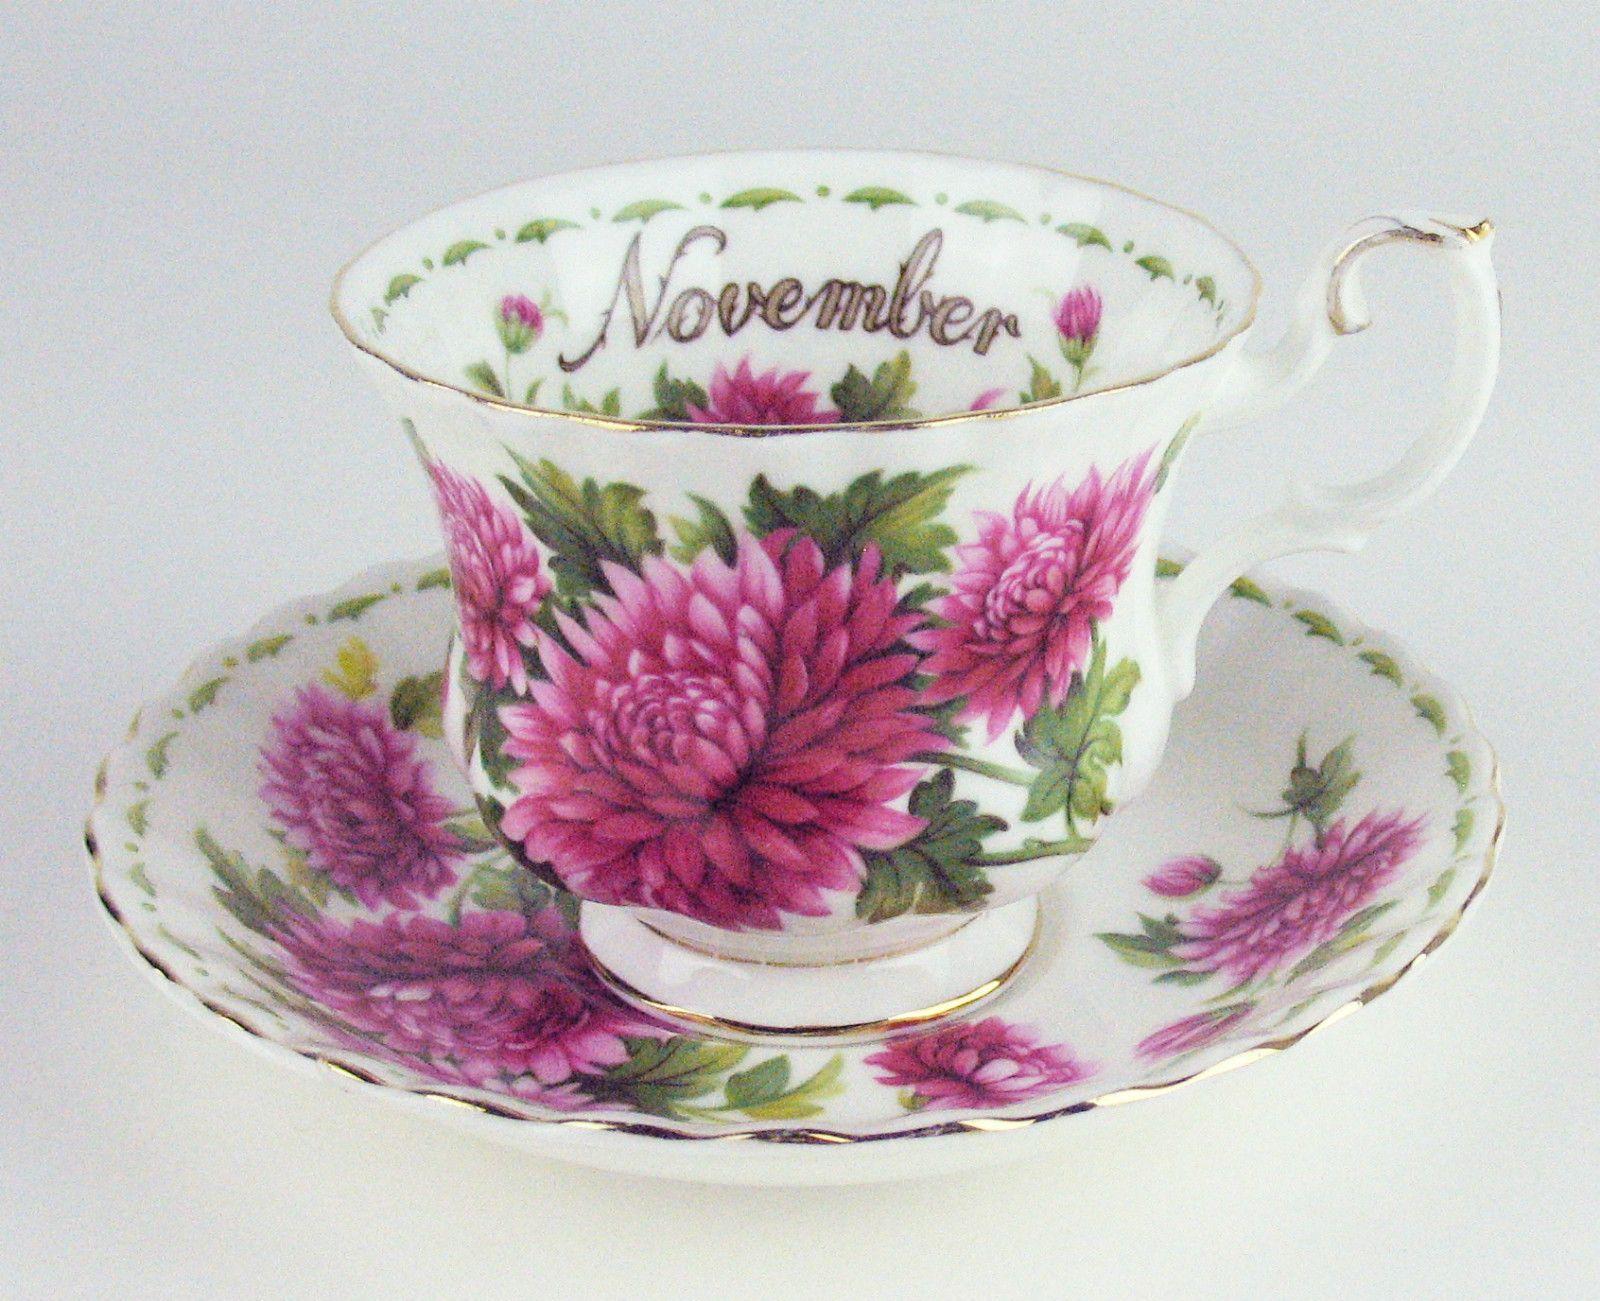 Vintage Royal Albert Teacup & Saucer Flower of the Month